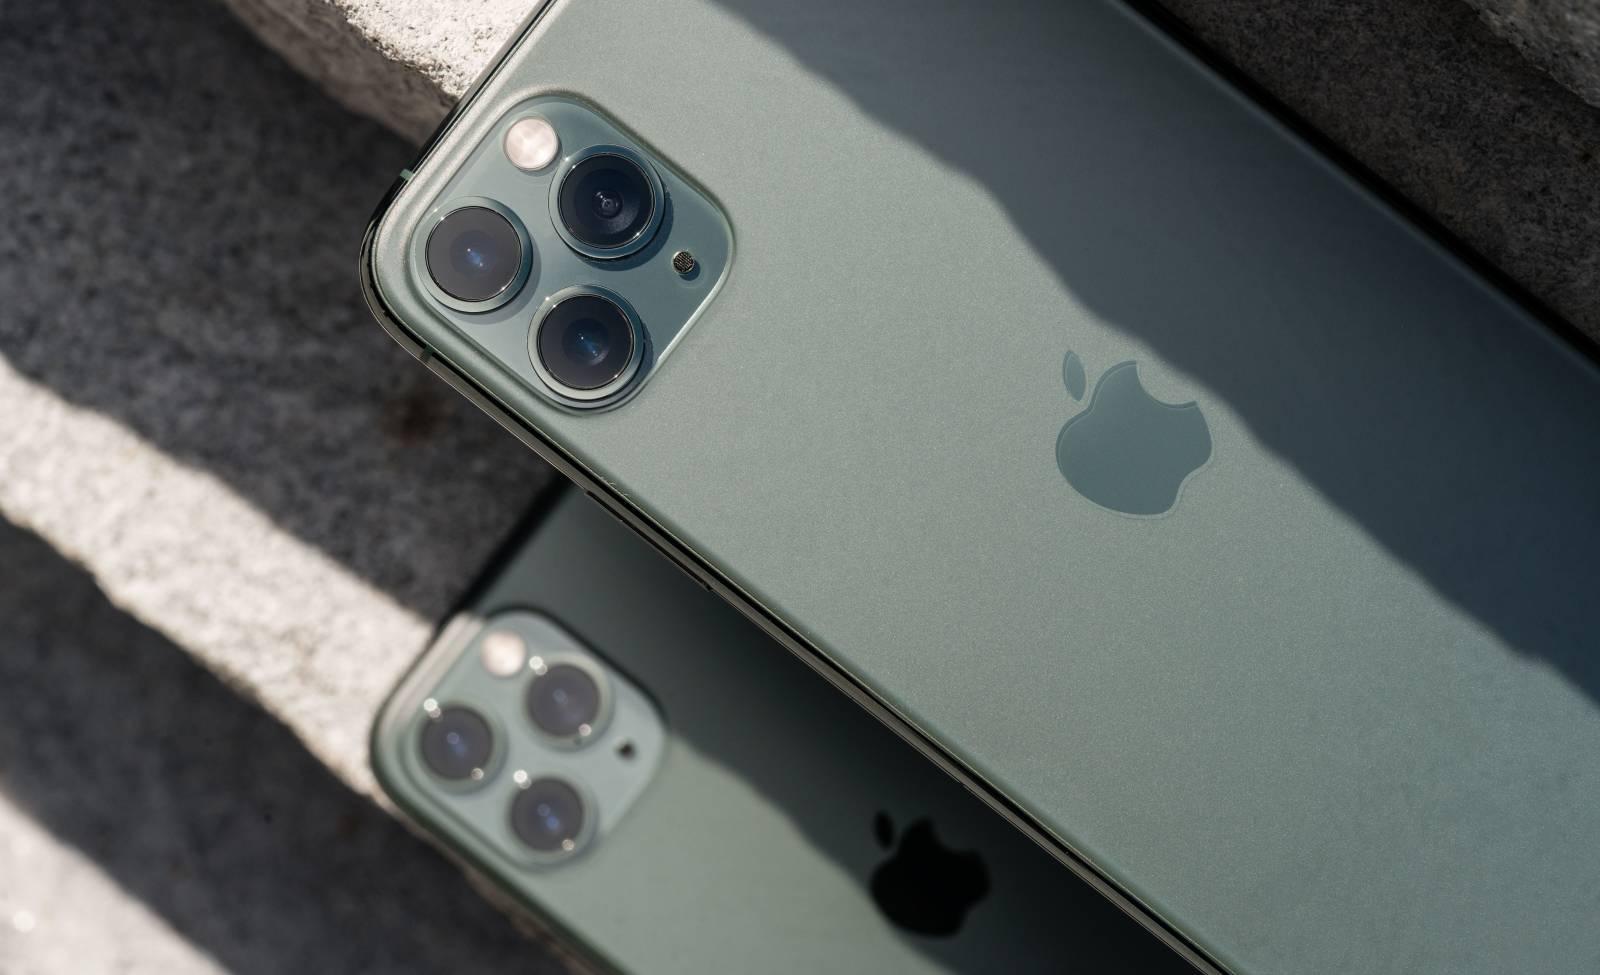 iphone spart tehnica nemaivazuta